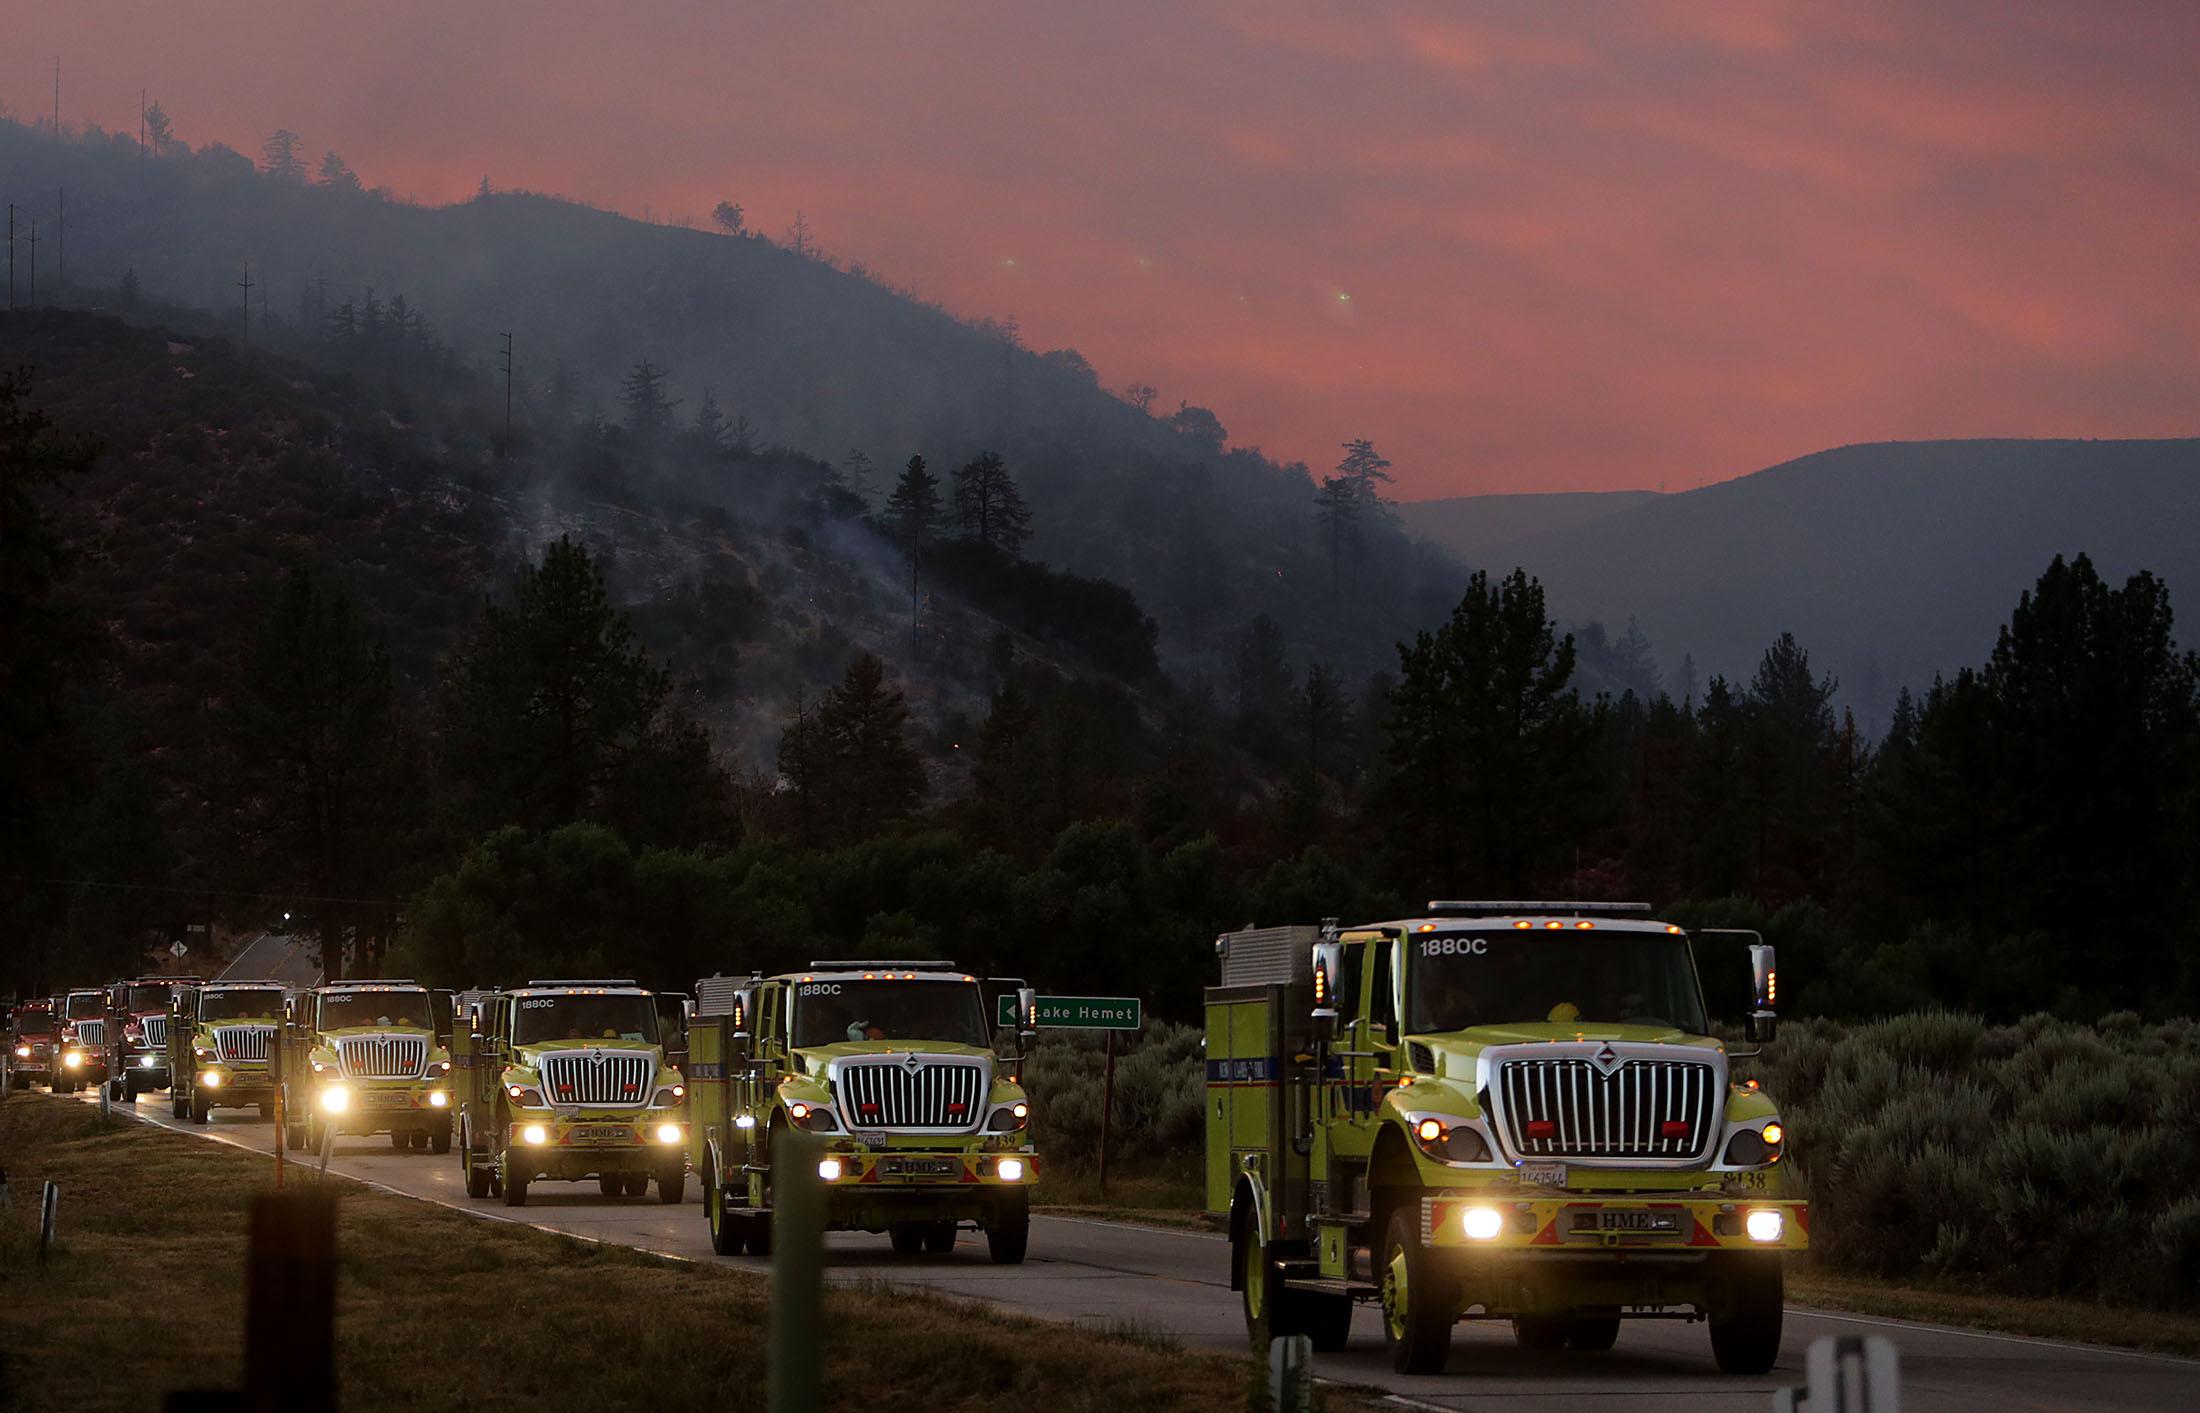 Brush trucks make their way along HWY 74 after battling the Cranston fire in Mountain Center area in the San Bernardino National Forest in Lake Hemet on Thursday, July 26, 2018.